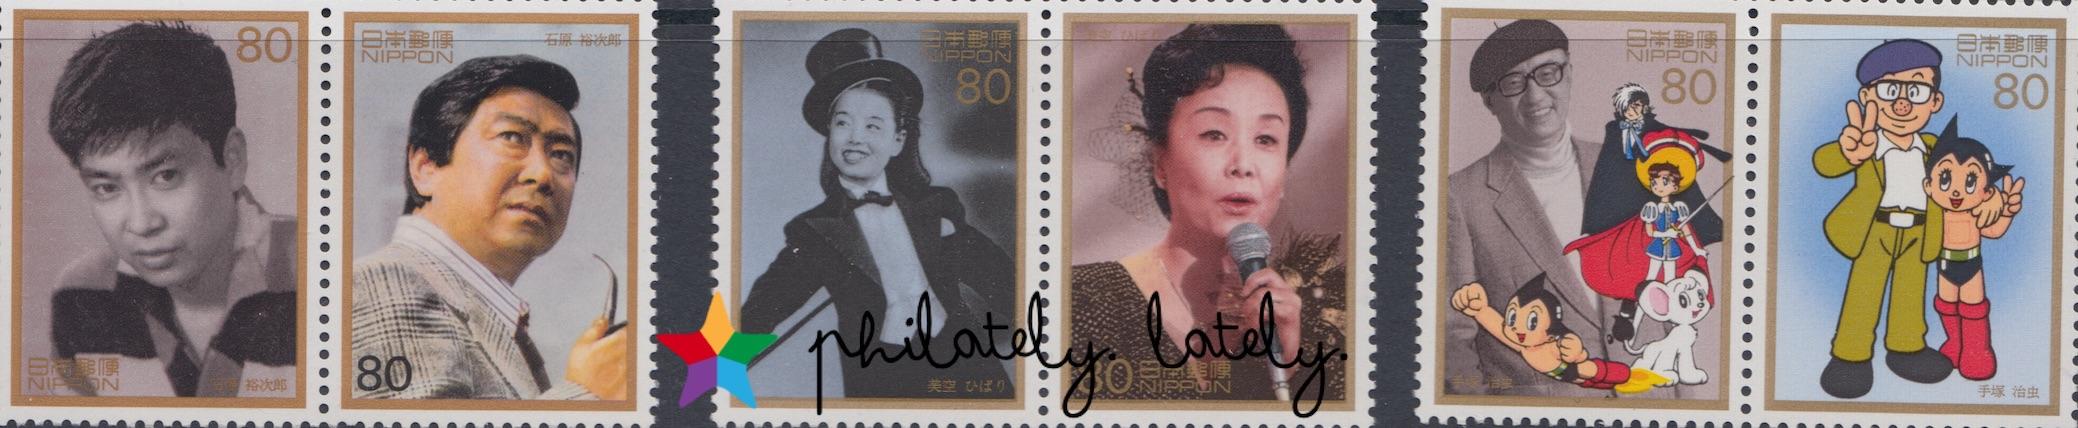 002_Japan_Astroboy_Stamps_1997.jpg